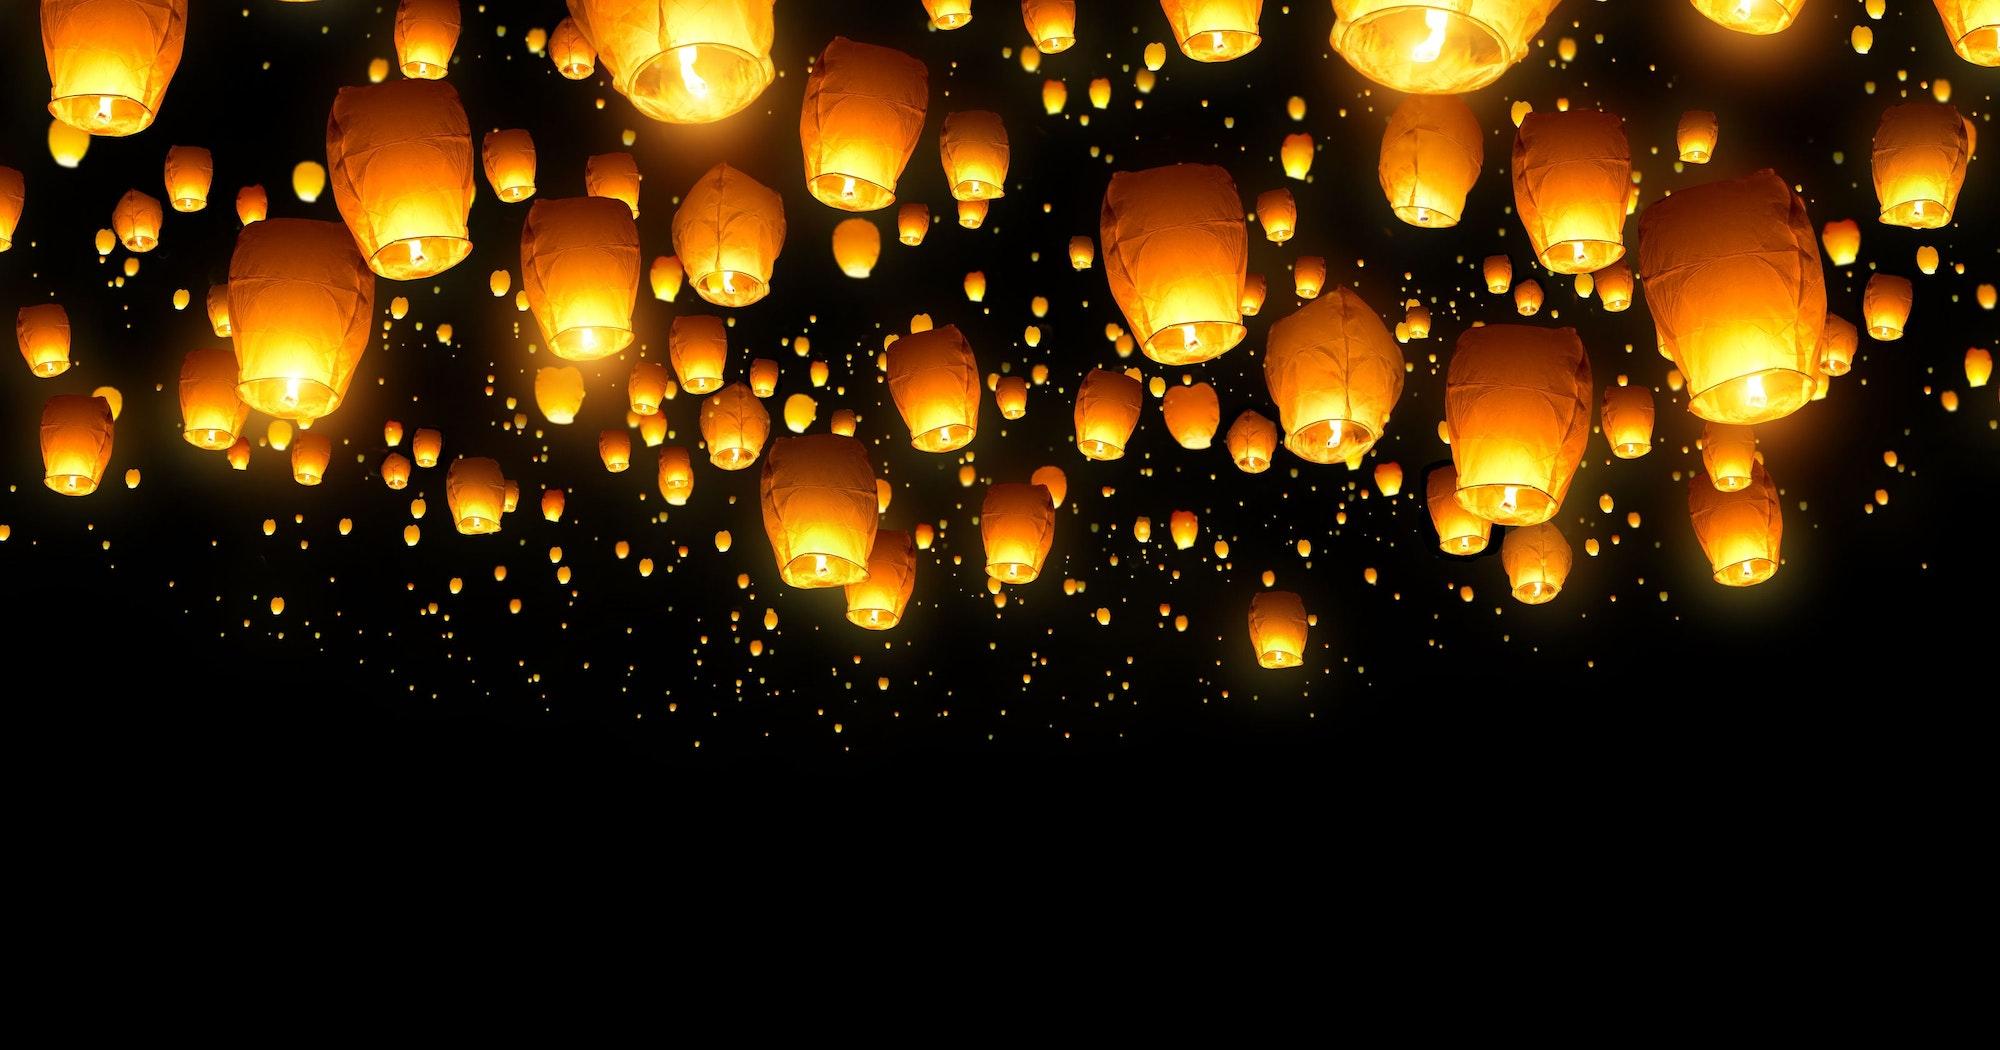 May contain: lamp and lantern